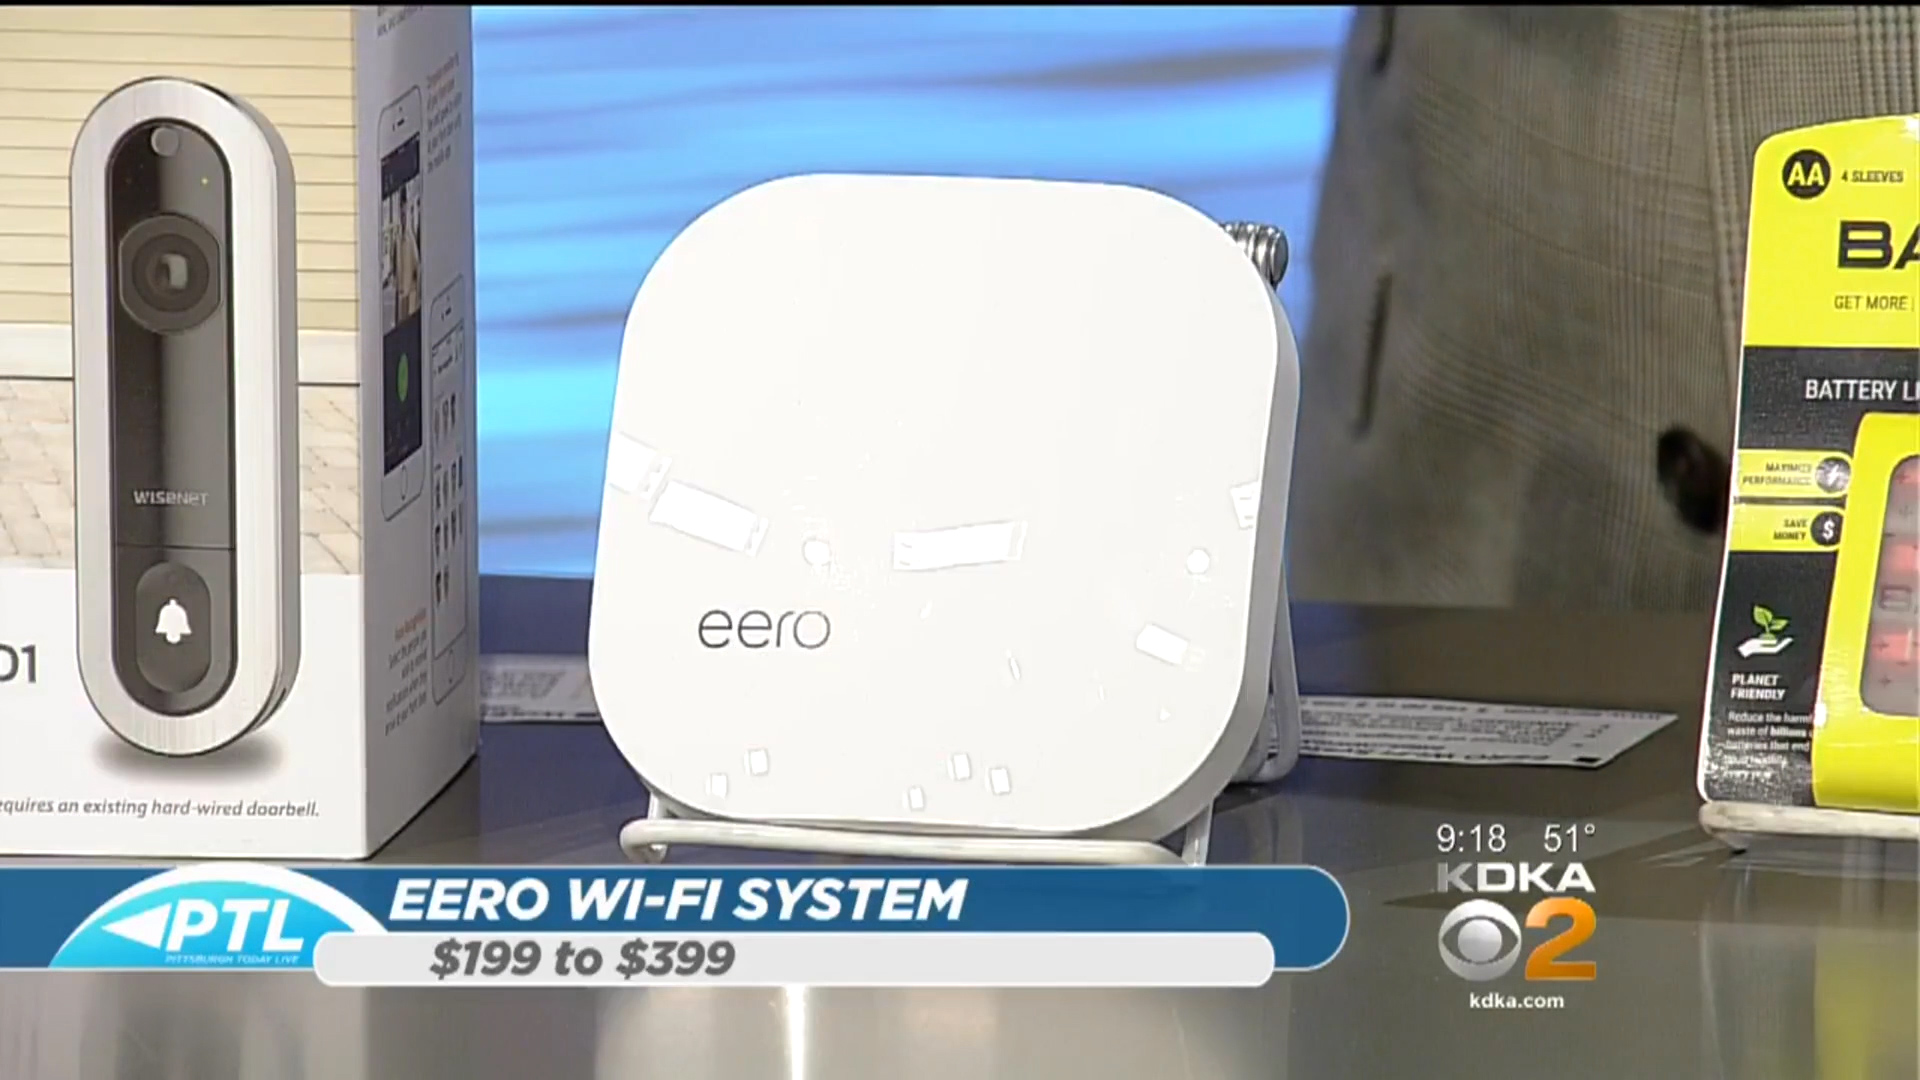 Eero Wifi System - $199.00 to $399.00 (877)-659-2347www.eero.com